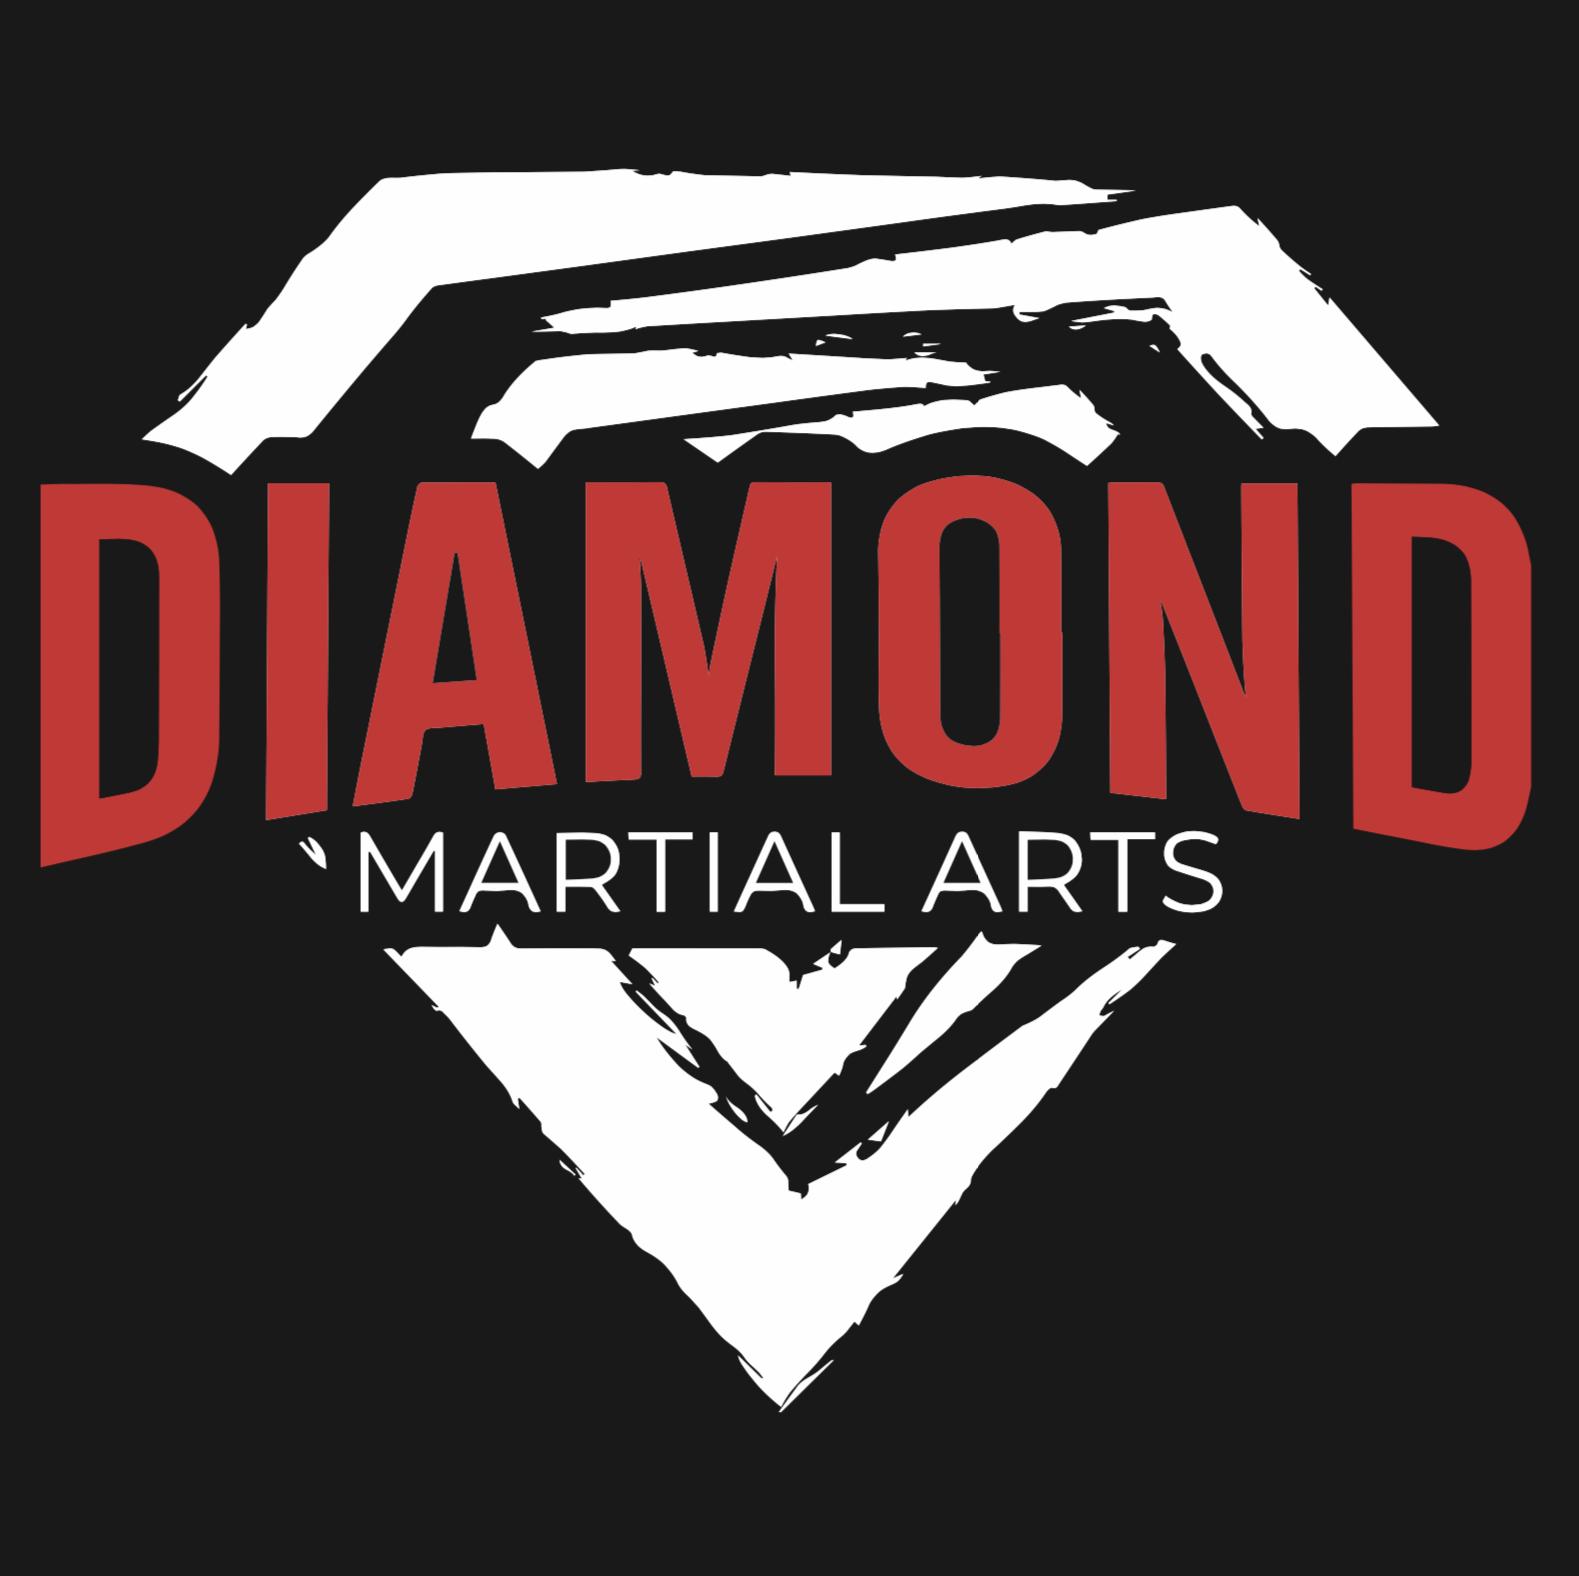 Diamond Martial Arts